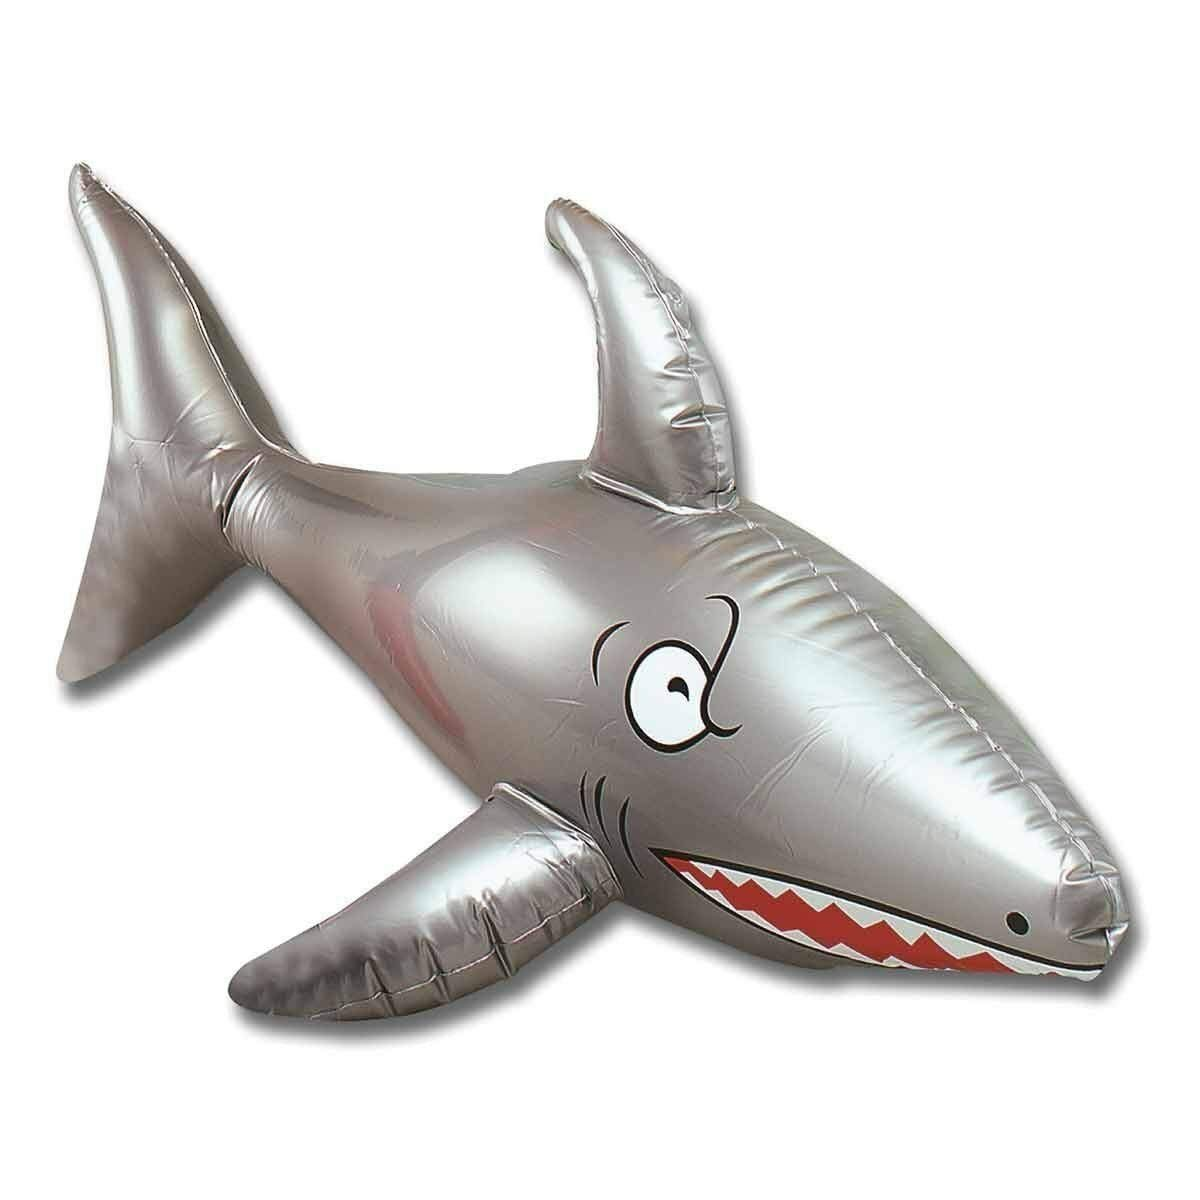 Tiburón inflable 90 cm Pirata playa fiesta Prop Sea Jaws Hawaiin ...